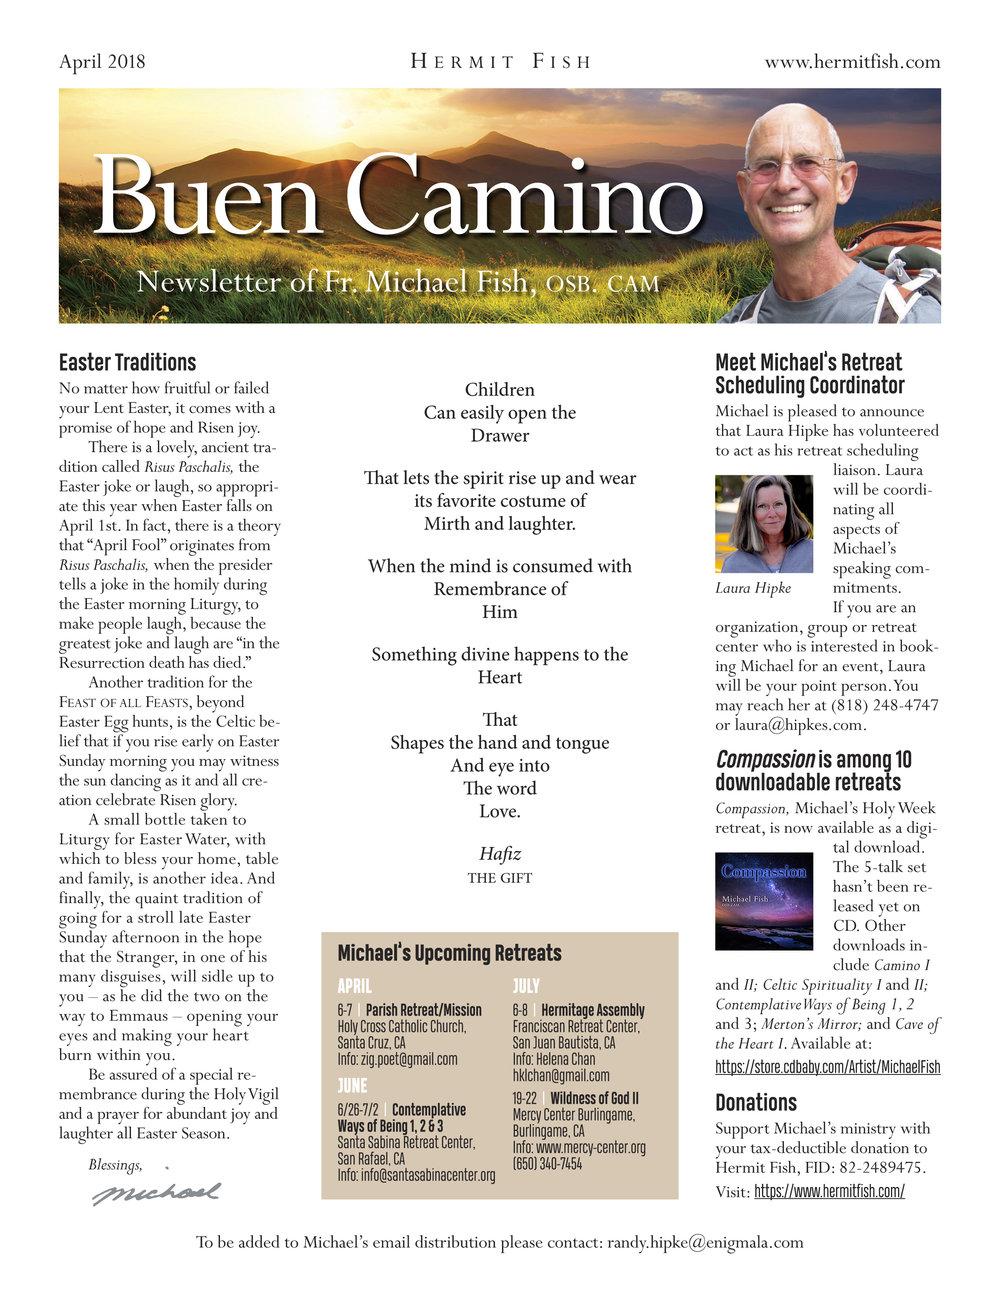 Buen Camino April 2018.jpg